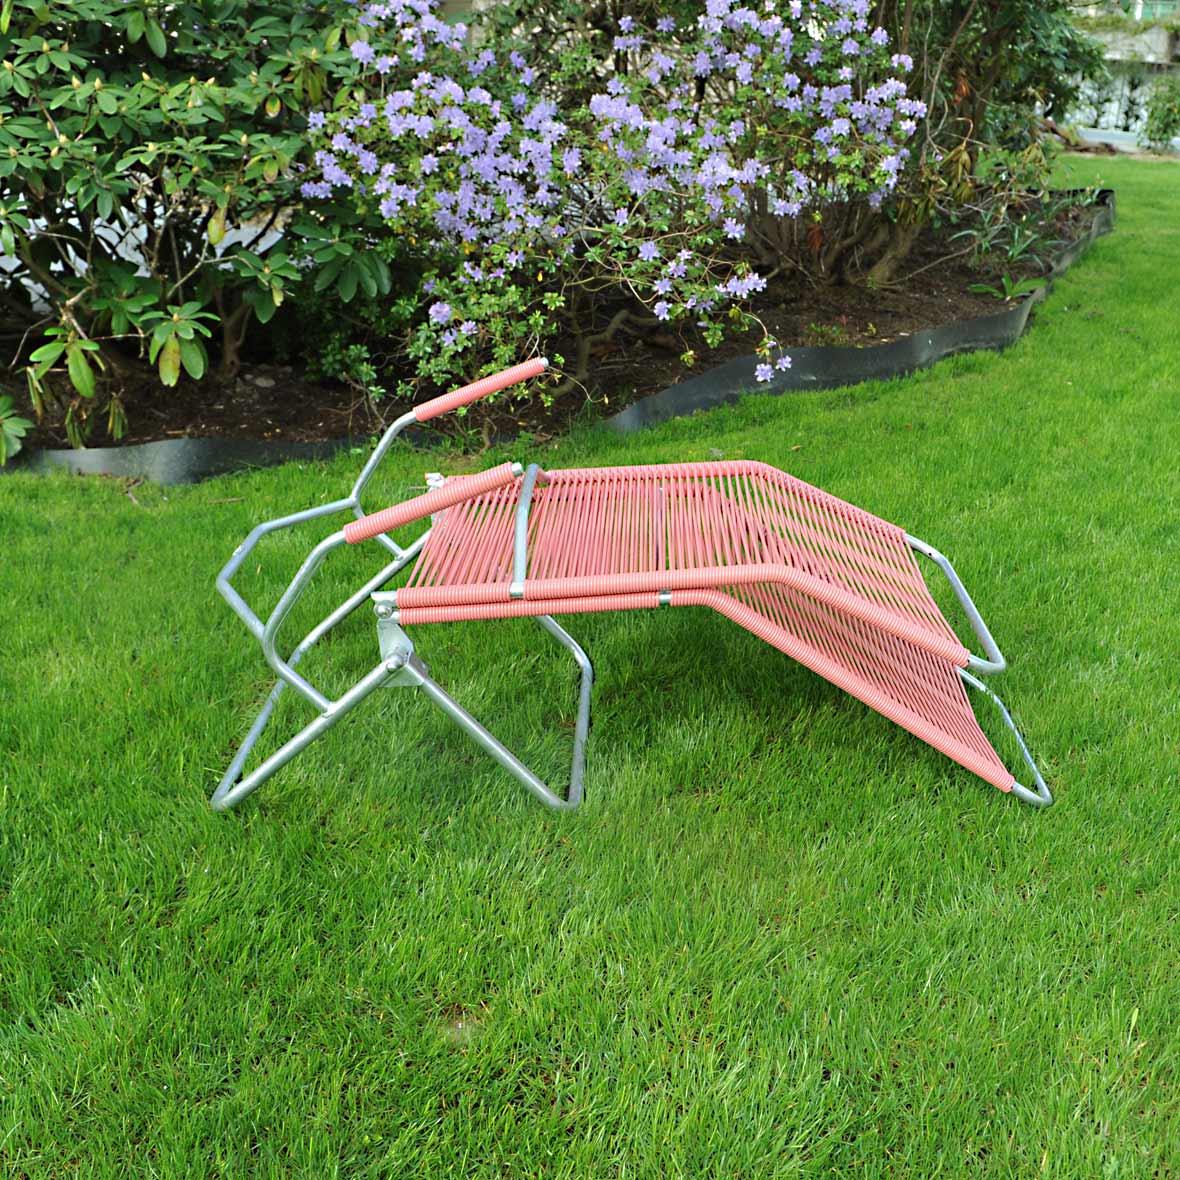 Liegestuhl Gebraucht.Altorfer Liegestuhl